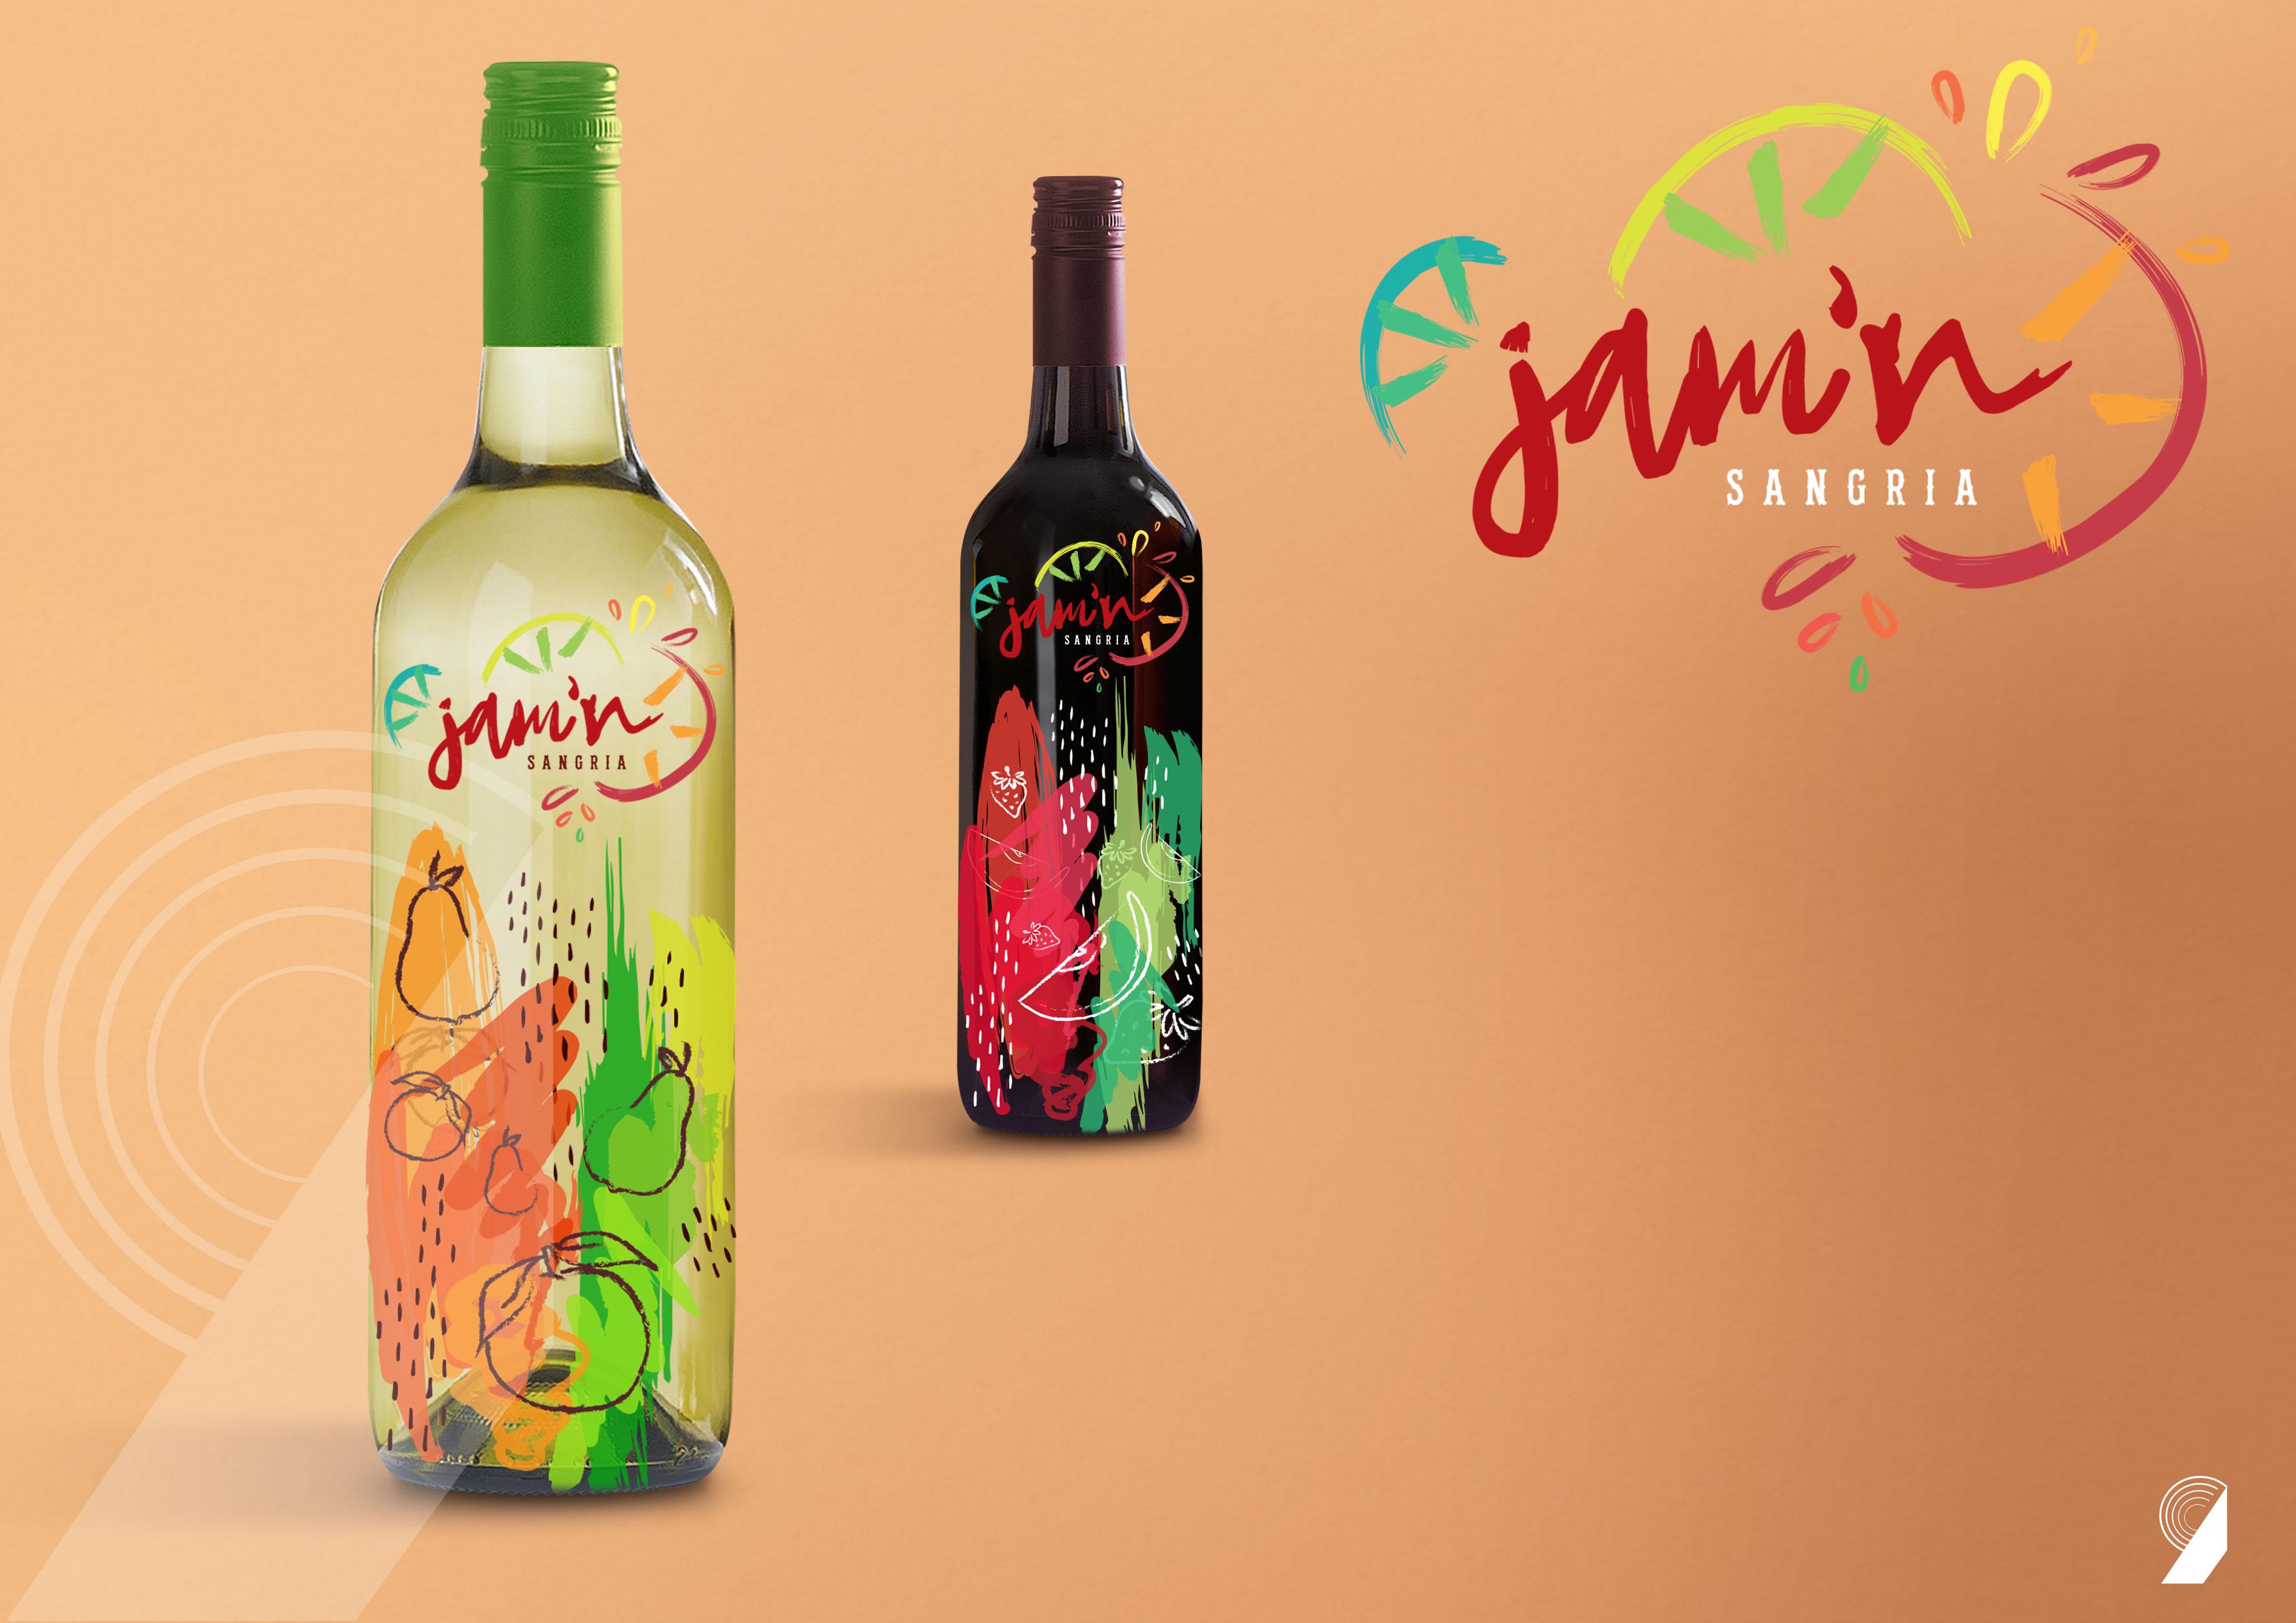 Jamn Sangria Red & White Wine Label Design